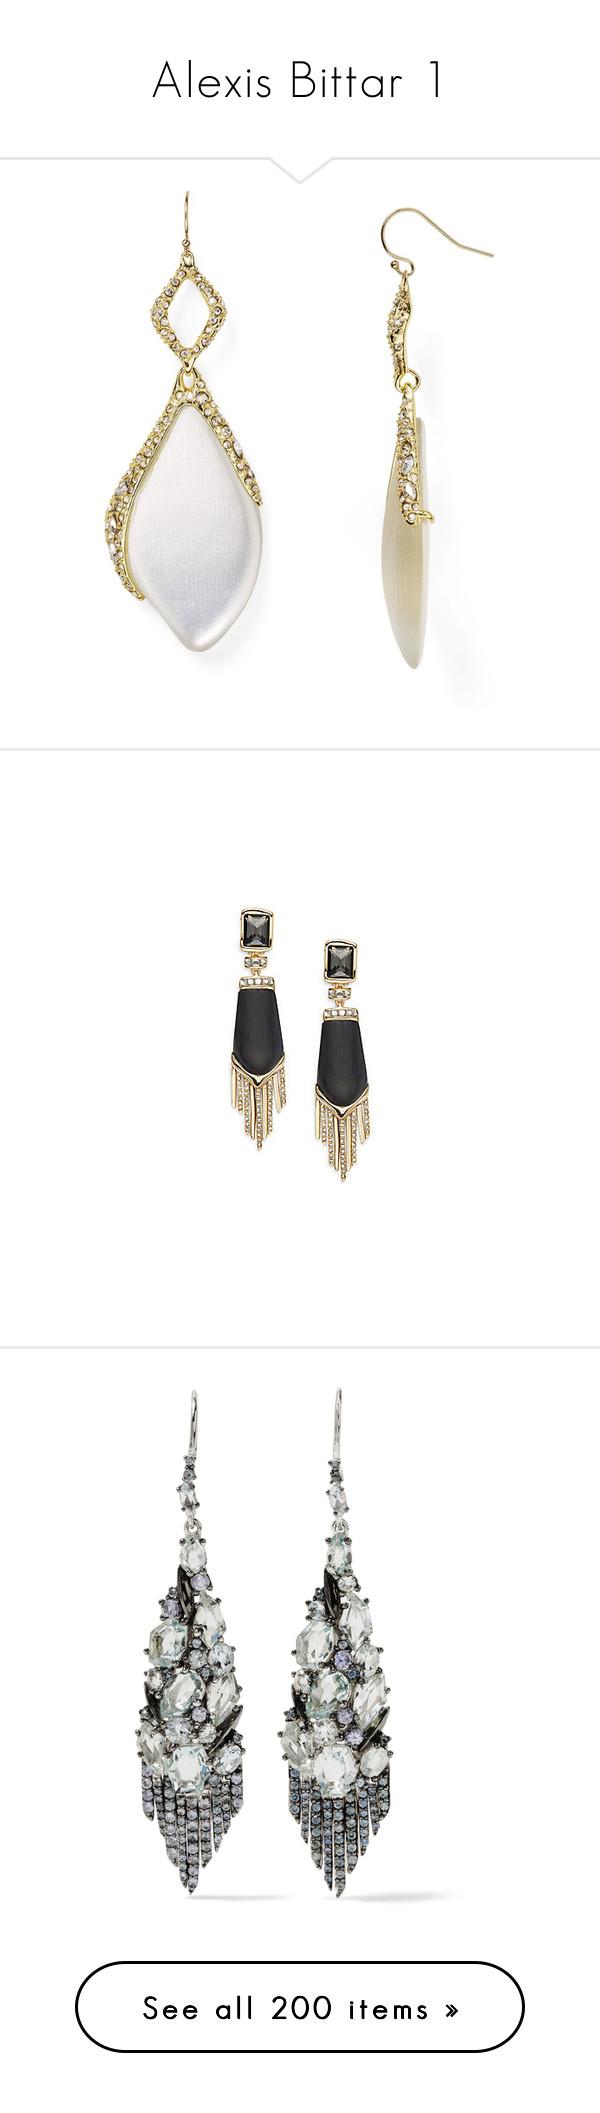 """Alexis Bittar 1"" by shulabond on Polyvore featuring jewelry, earrings, drop earrings, acrylic earrings, swarovski crystal jewelry, swarovski crystal earrings, lucite earrings, black, cabochon jewelry and fringe jewelry"